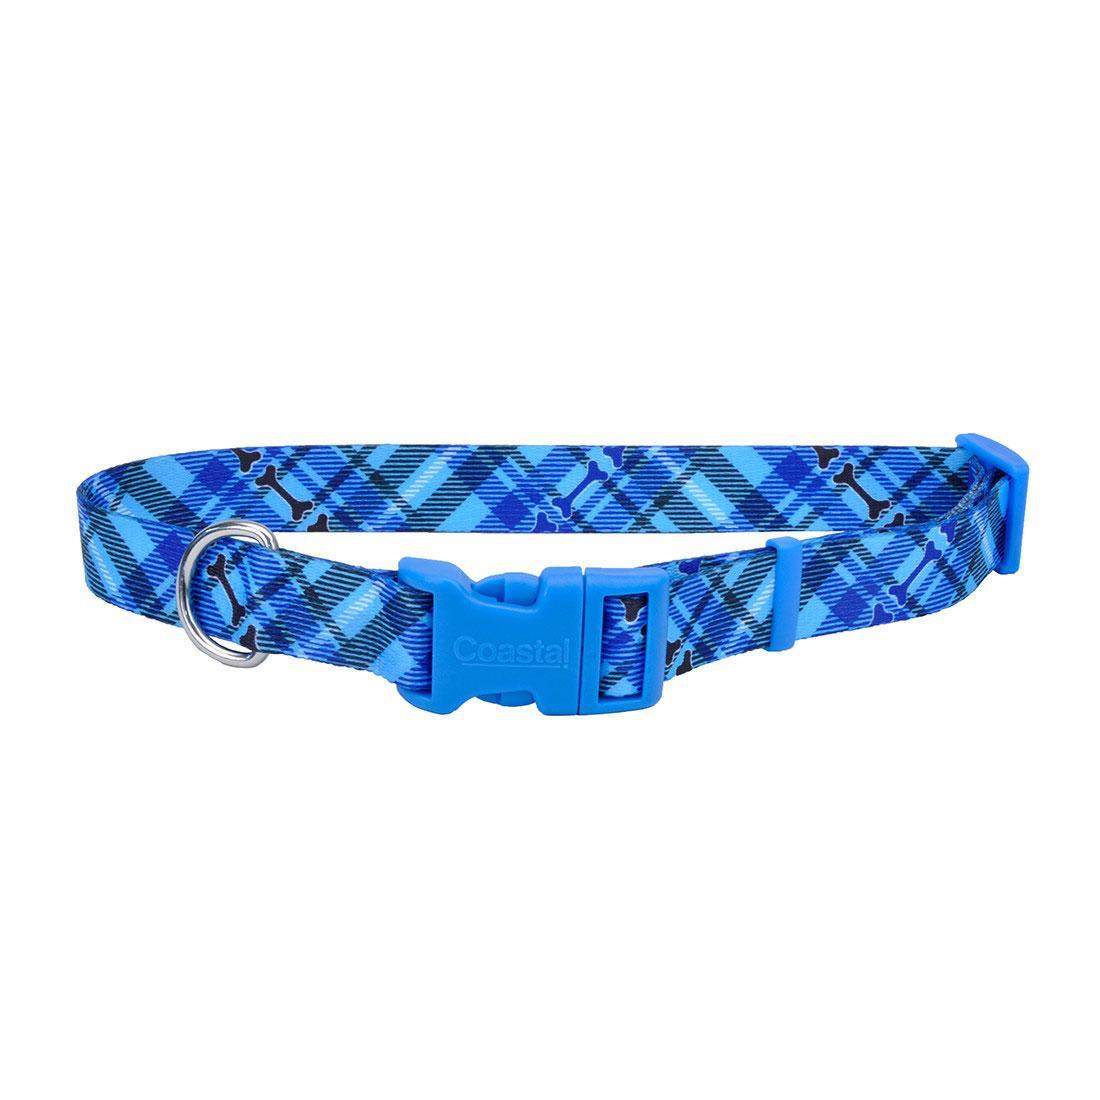 Styles Adjustable Dog Collar, Plaid Bones Image